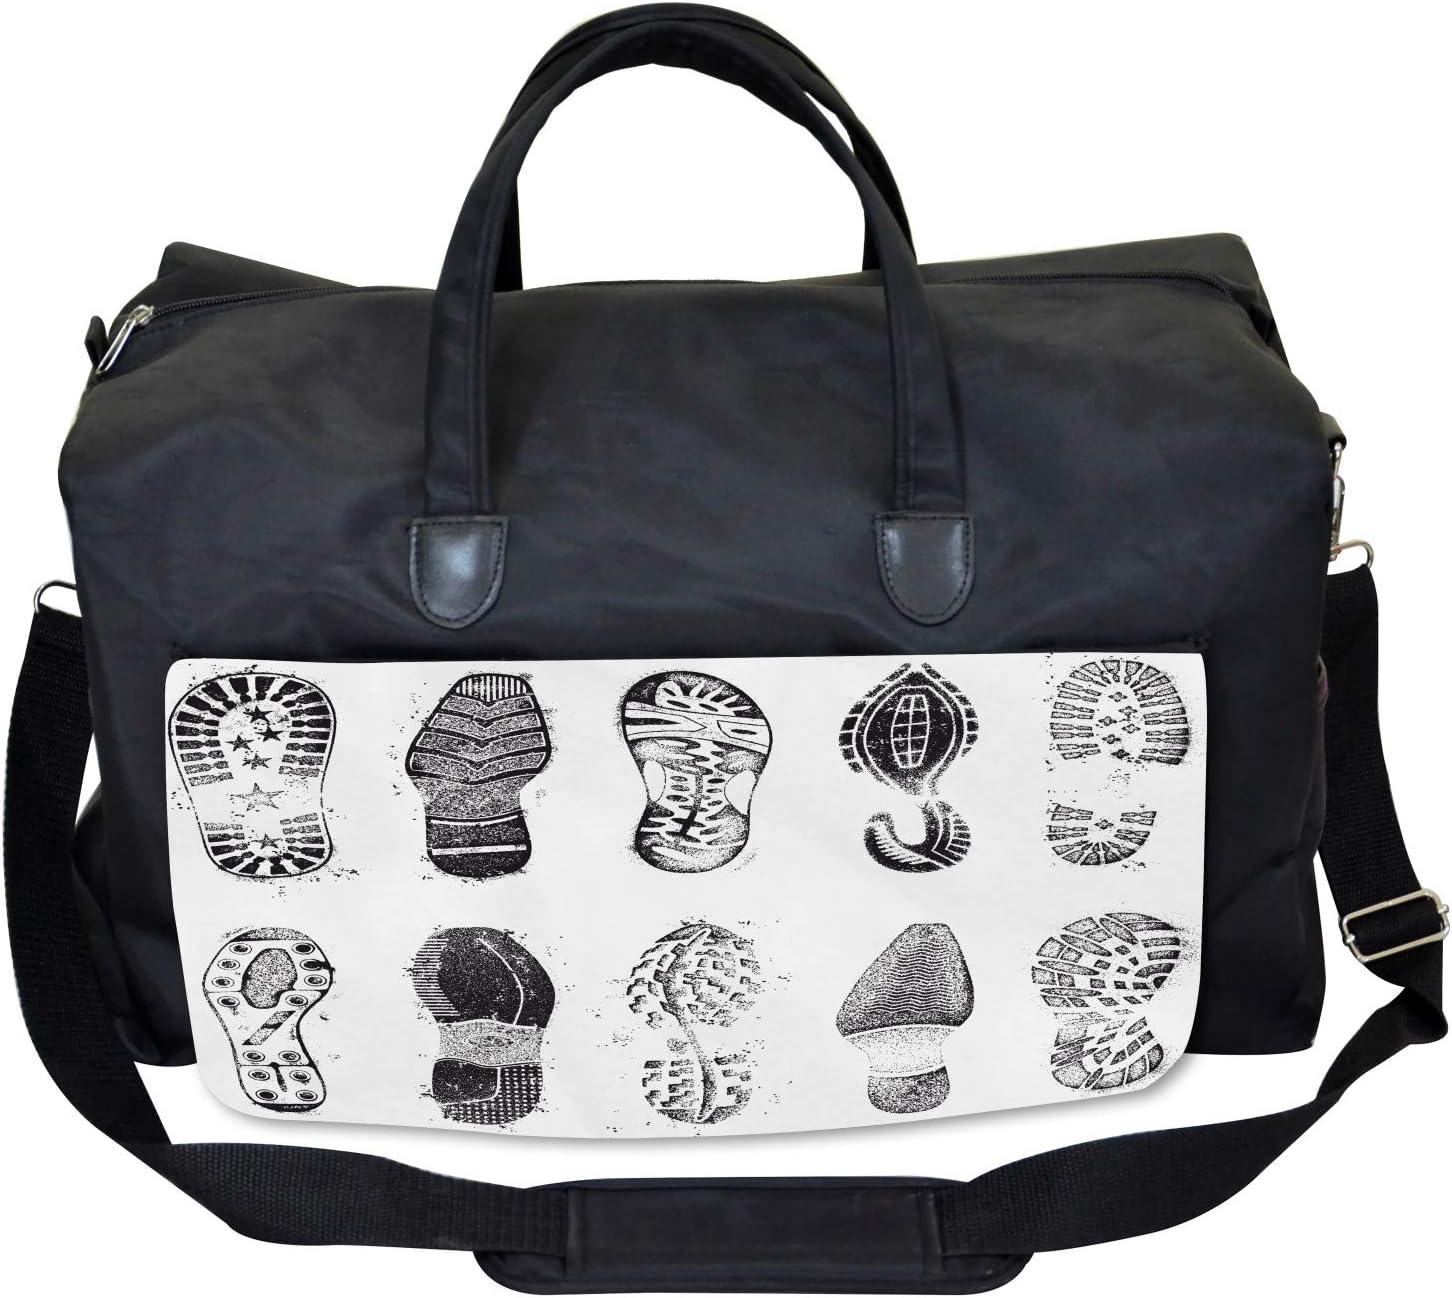 Ambesonne Grunge Gym Bag Damaged Murky Artisan Large Weekender Carry-on